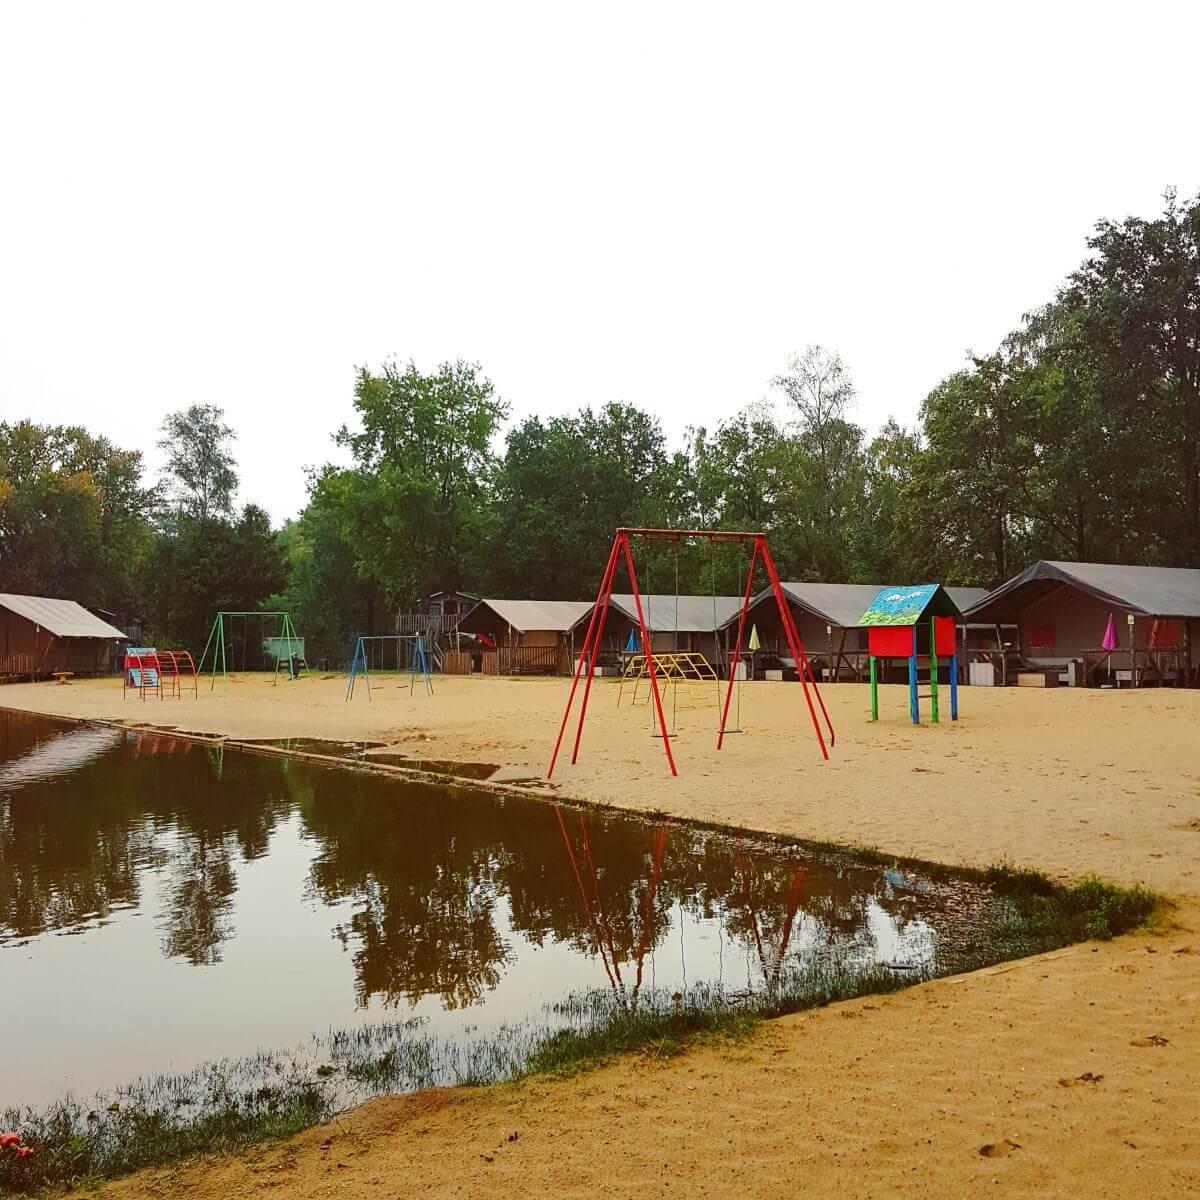 Vakantiepark Dierenbos in het Brabantse Vinkel